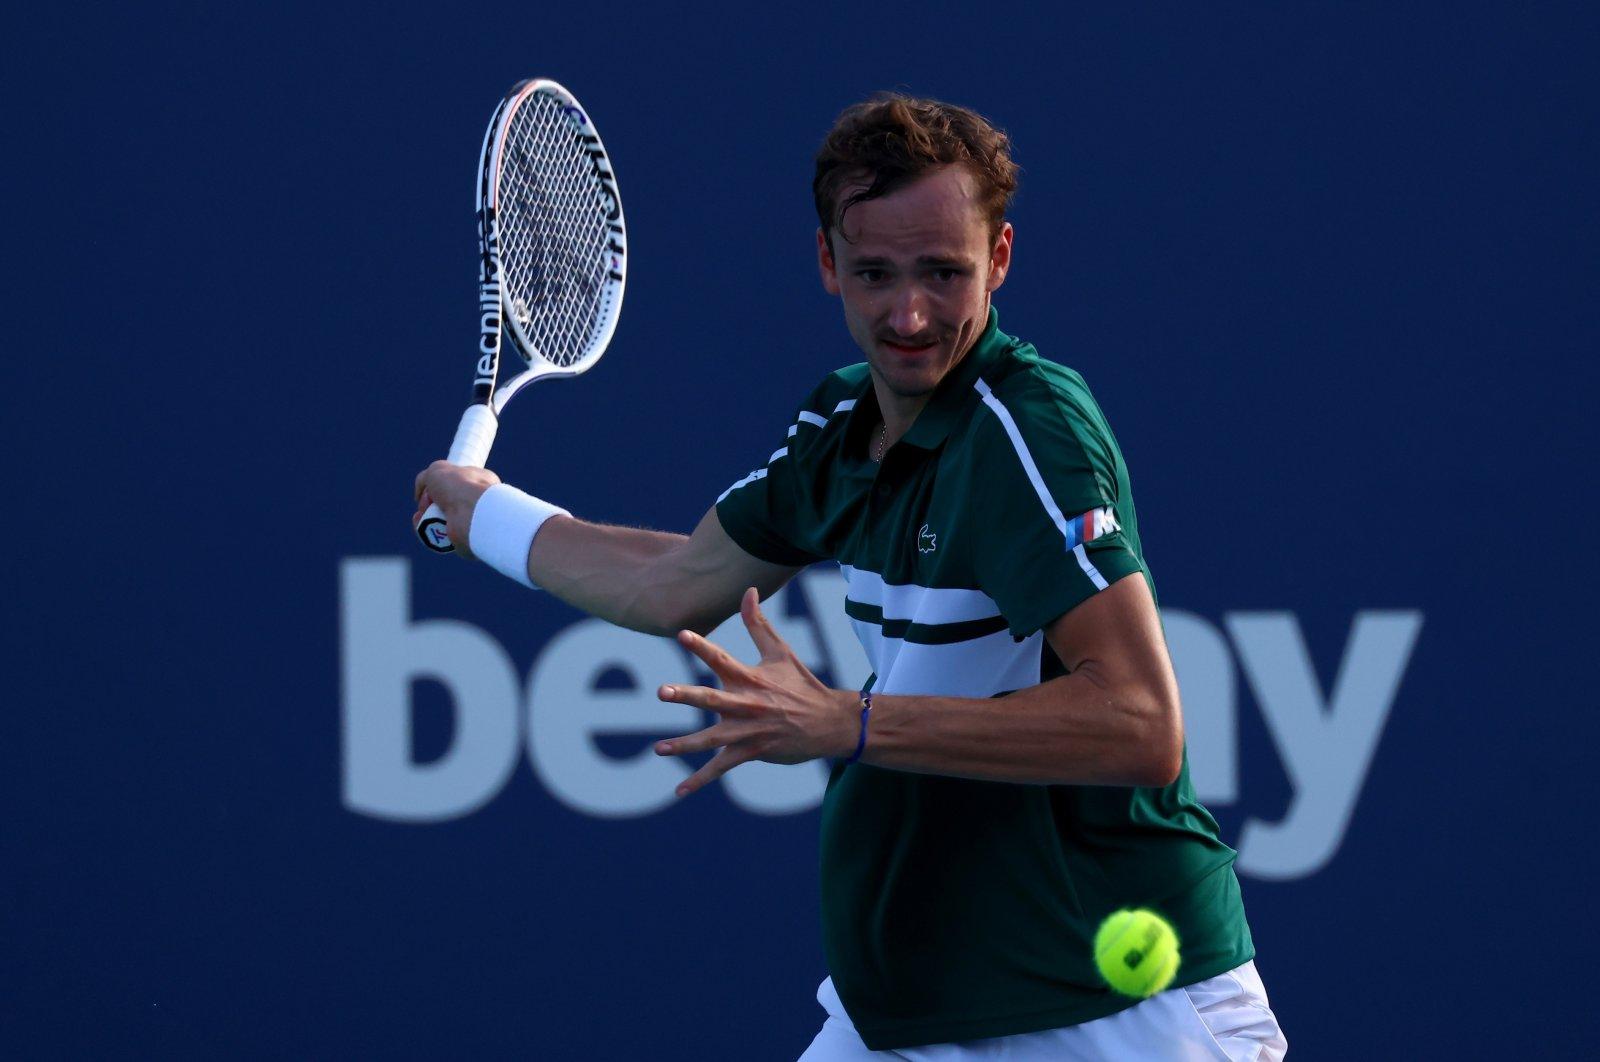 Russia's Daniil Medvedev returns a shot against Australia's Alexei Popyrin during a Miami Open men's singles third-round match in Miami Gardens, Florida, U.S., March 28, 2021. (AFP Photo)